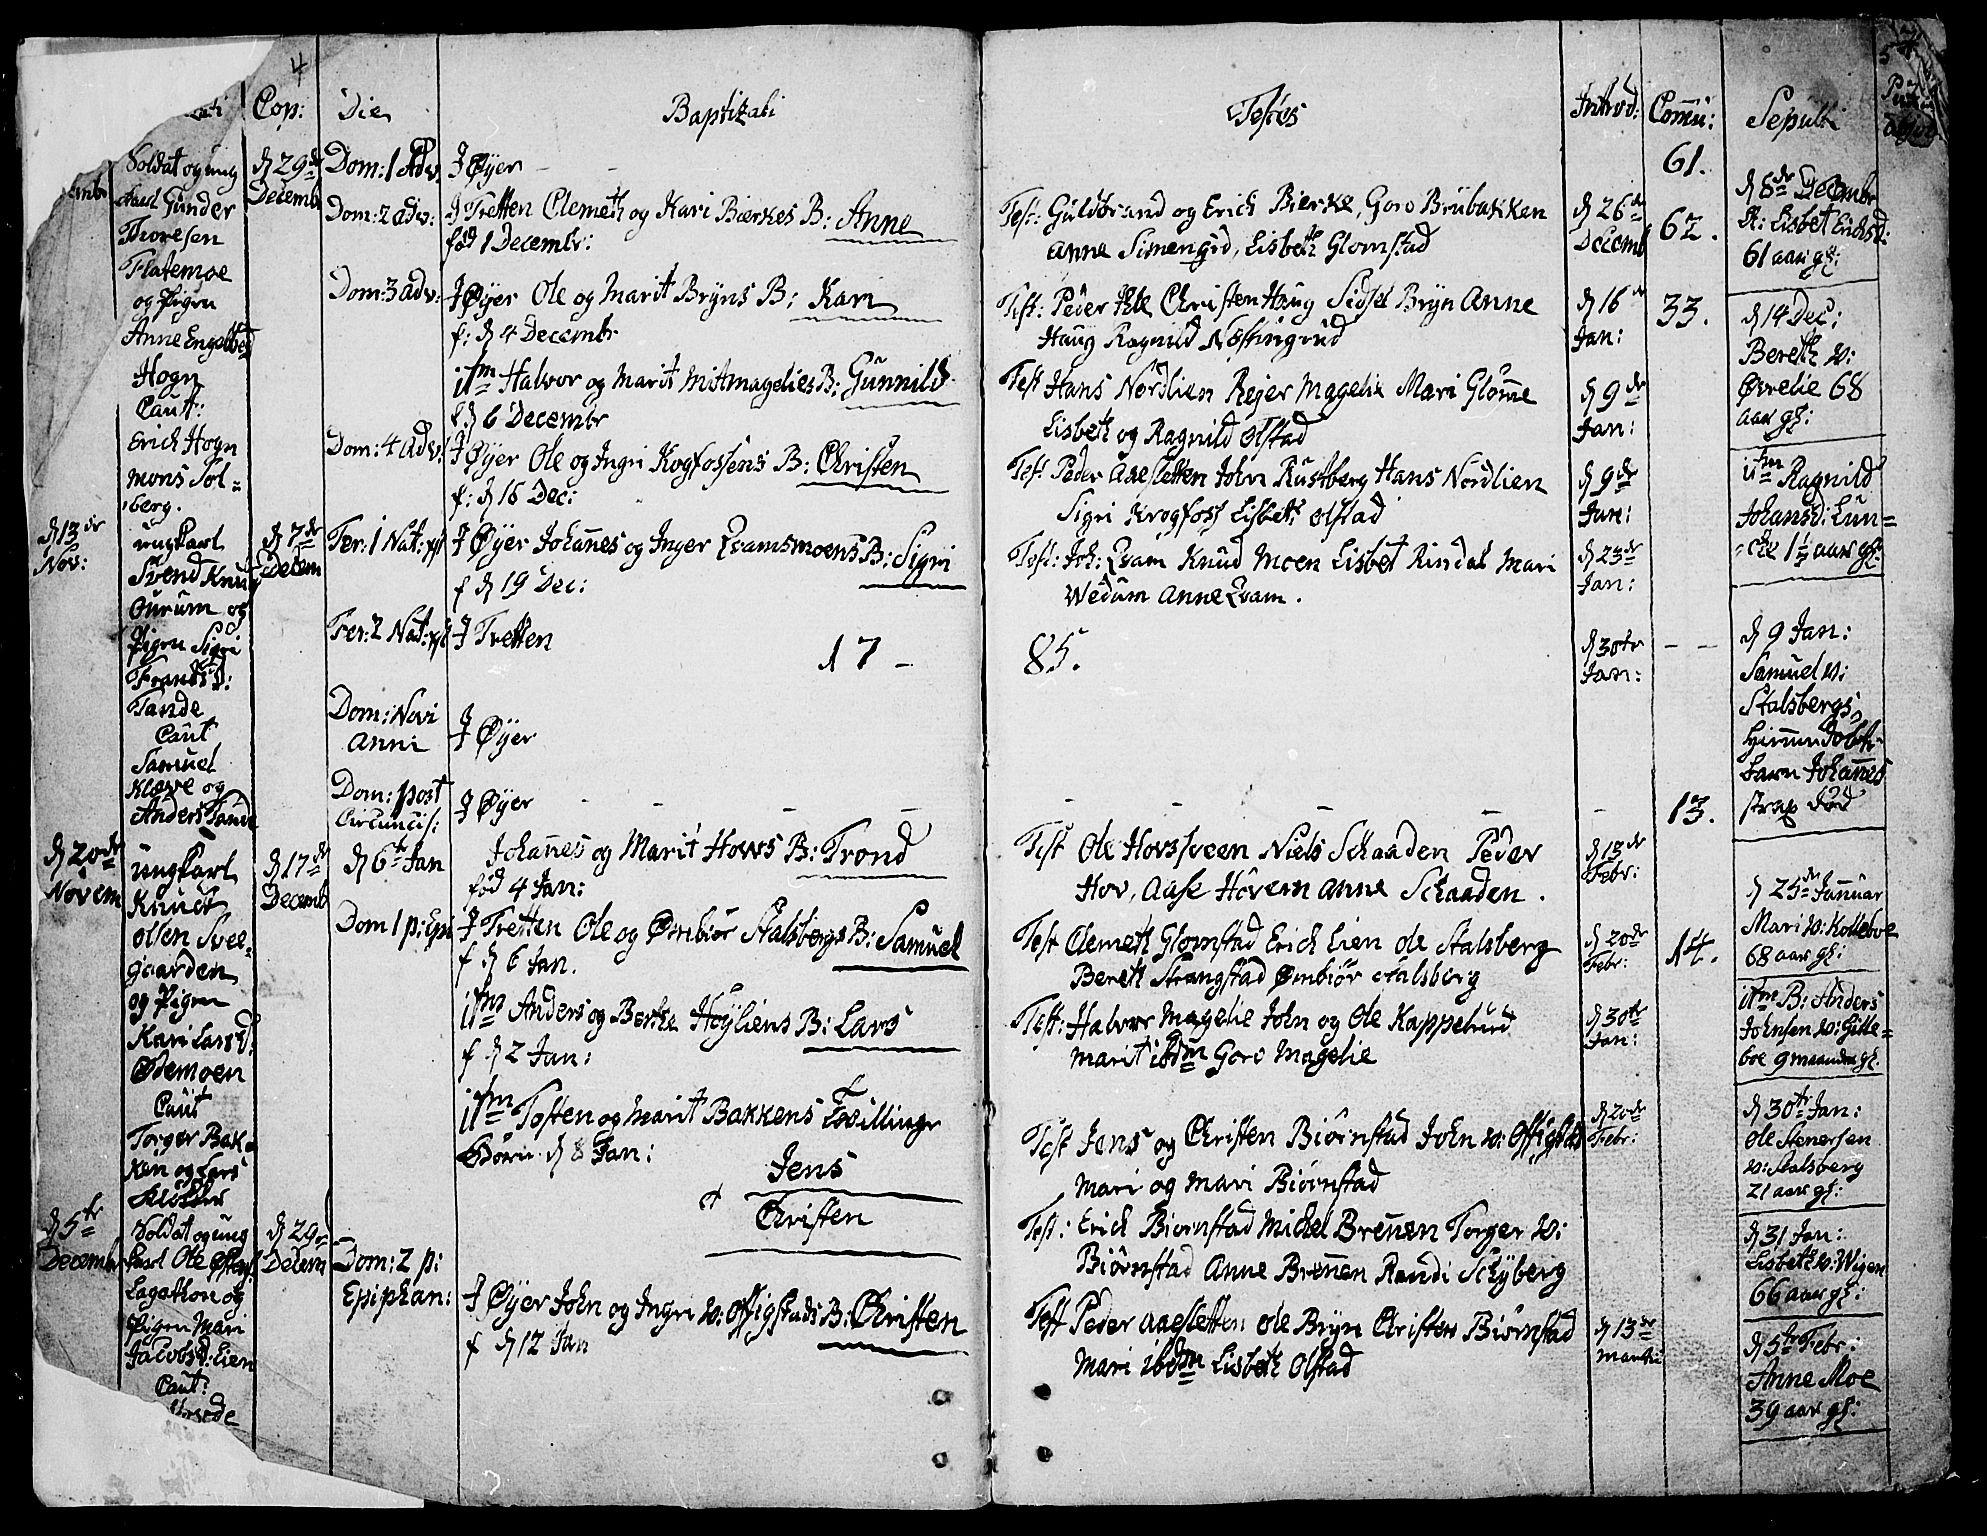 SAH, Øyer prestekontor, Ministerialbok nr. 3, 1784-1824, s. 4-5